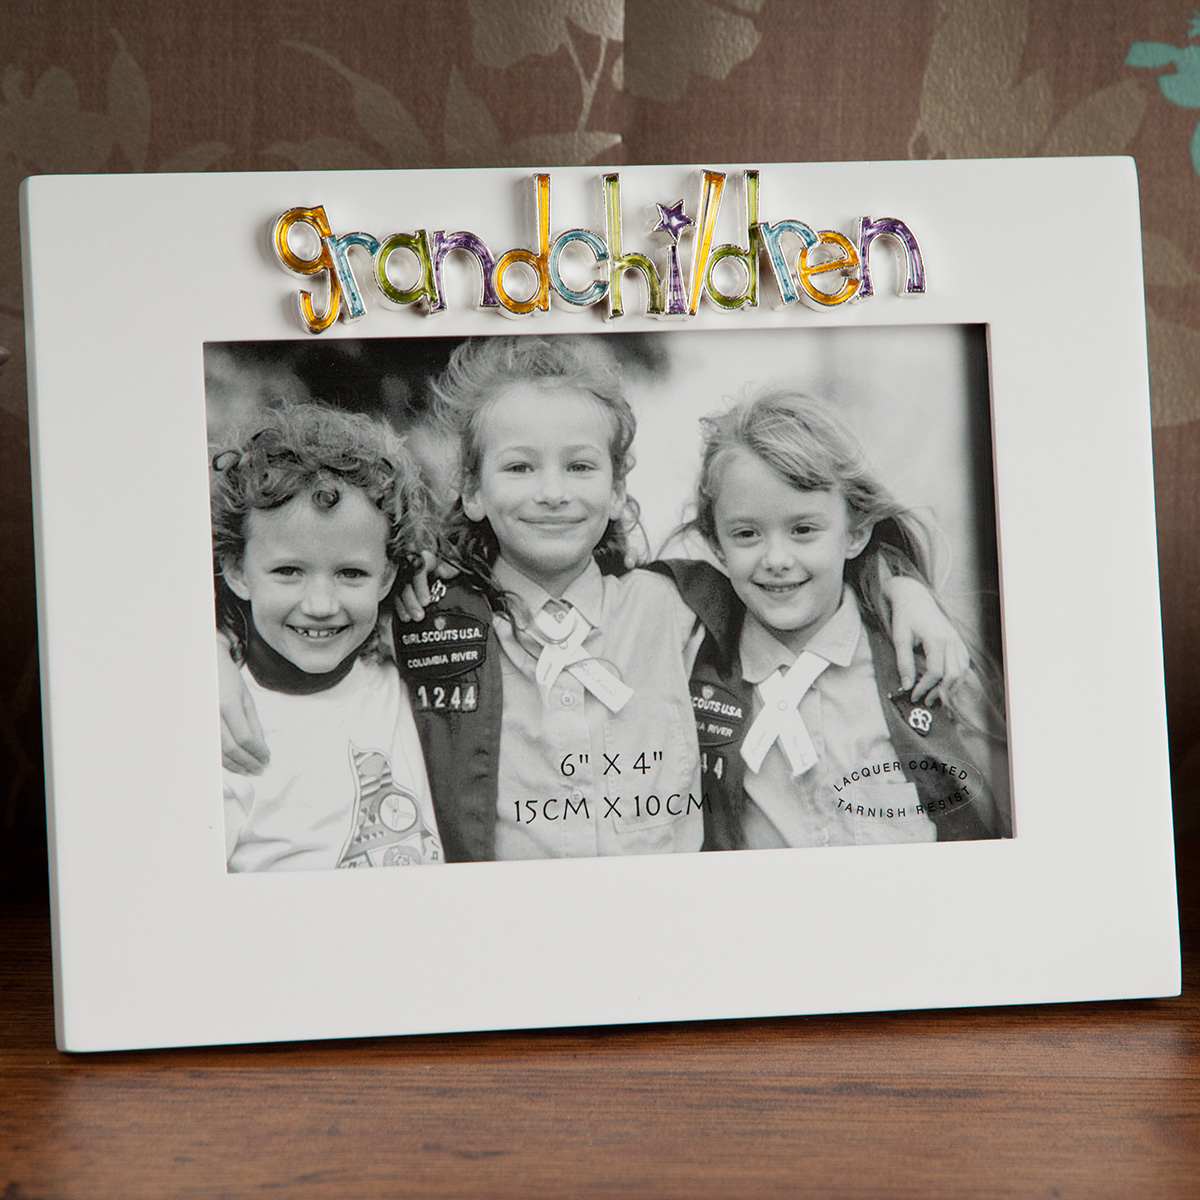 Grandchildren Photo Frame Gifts For Kids From